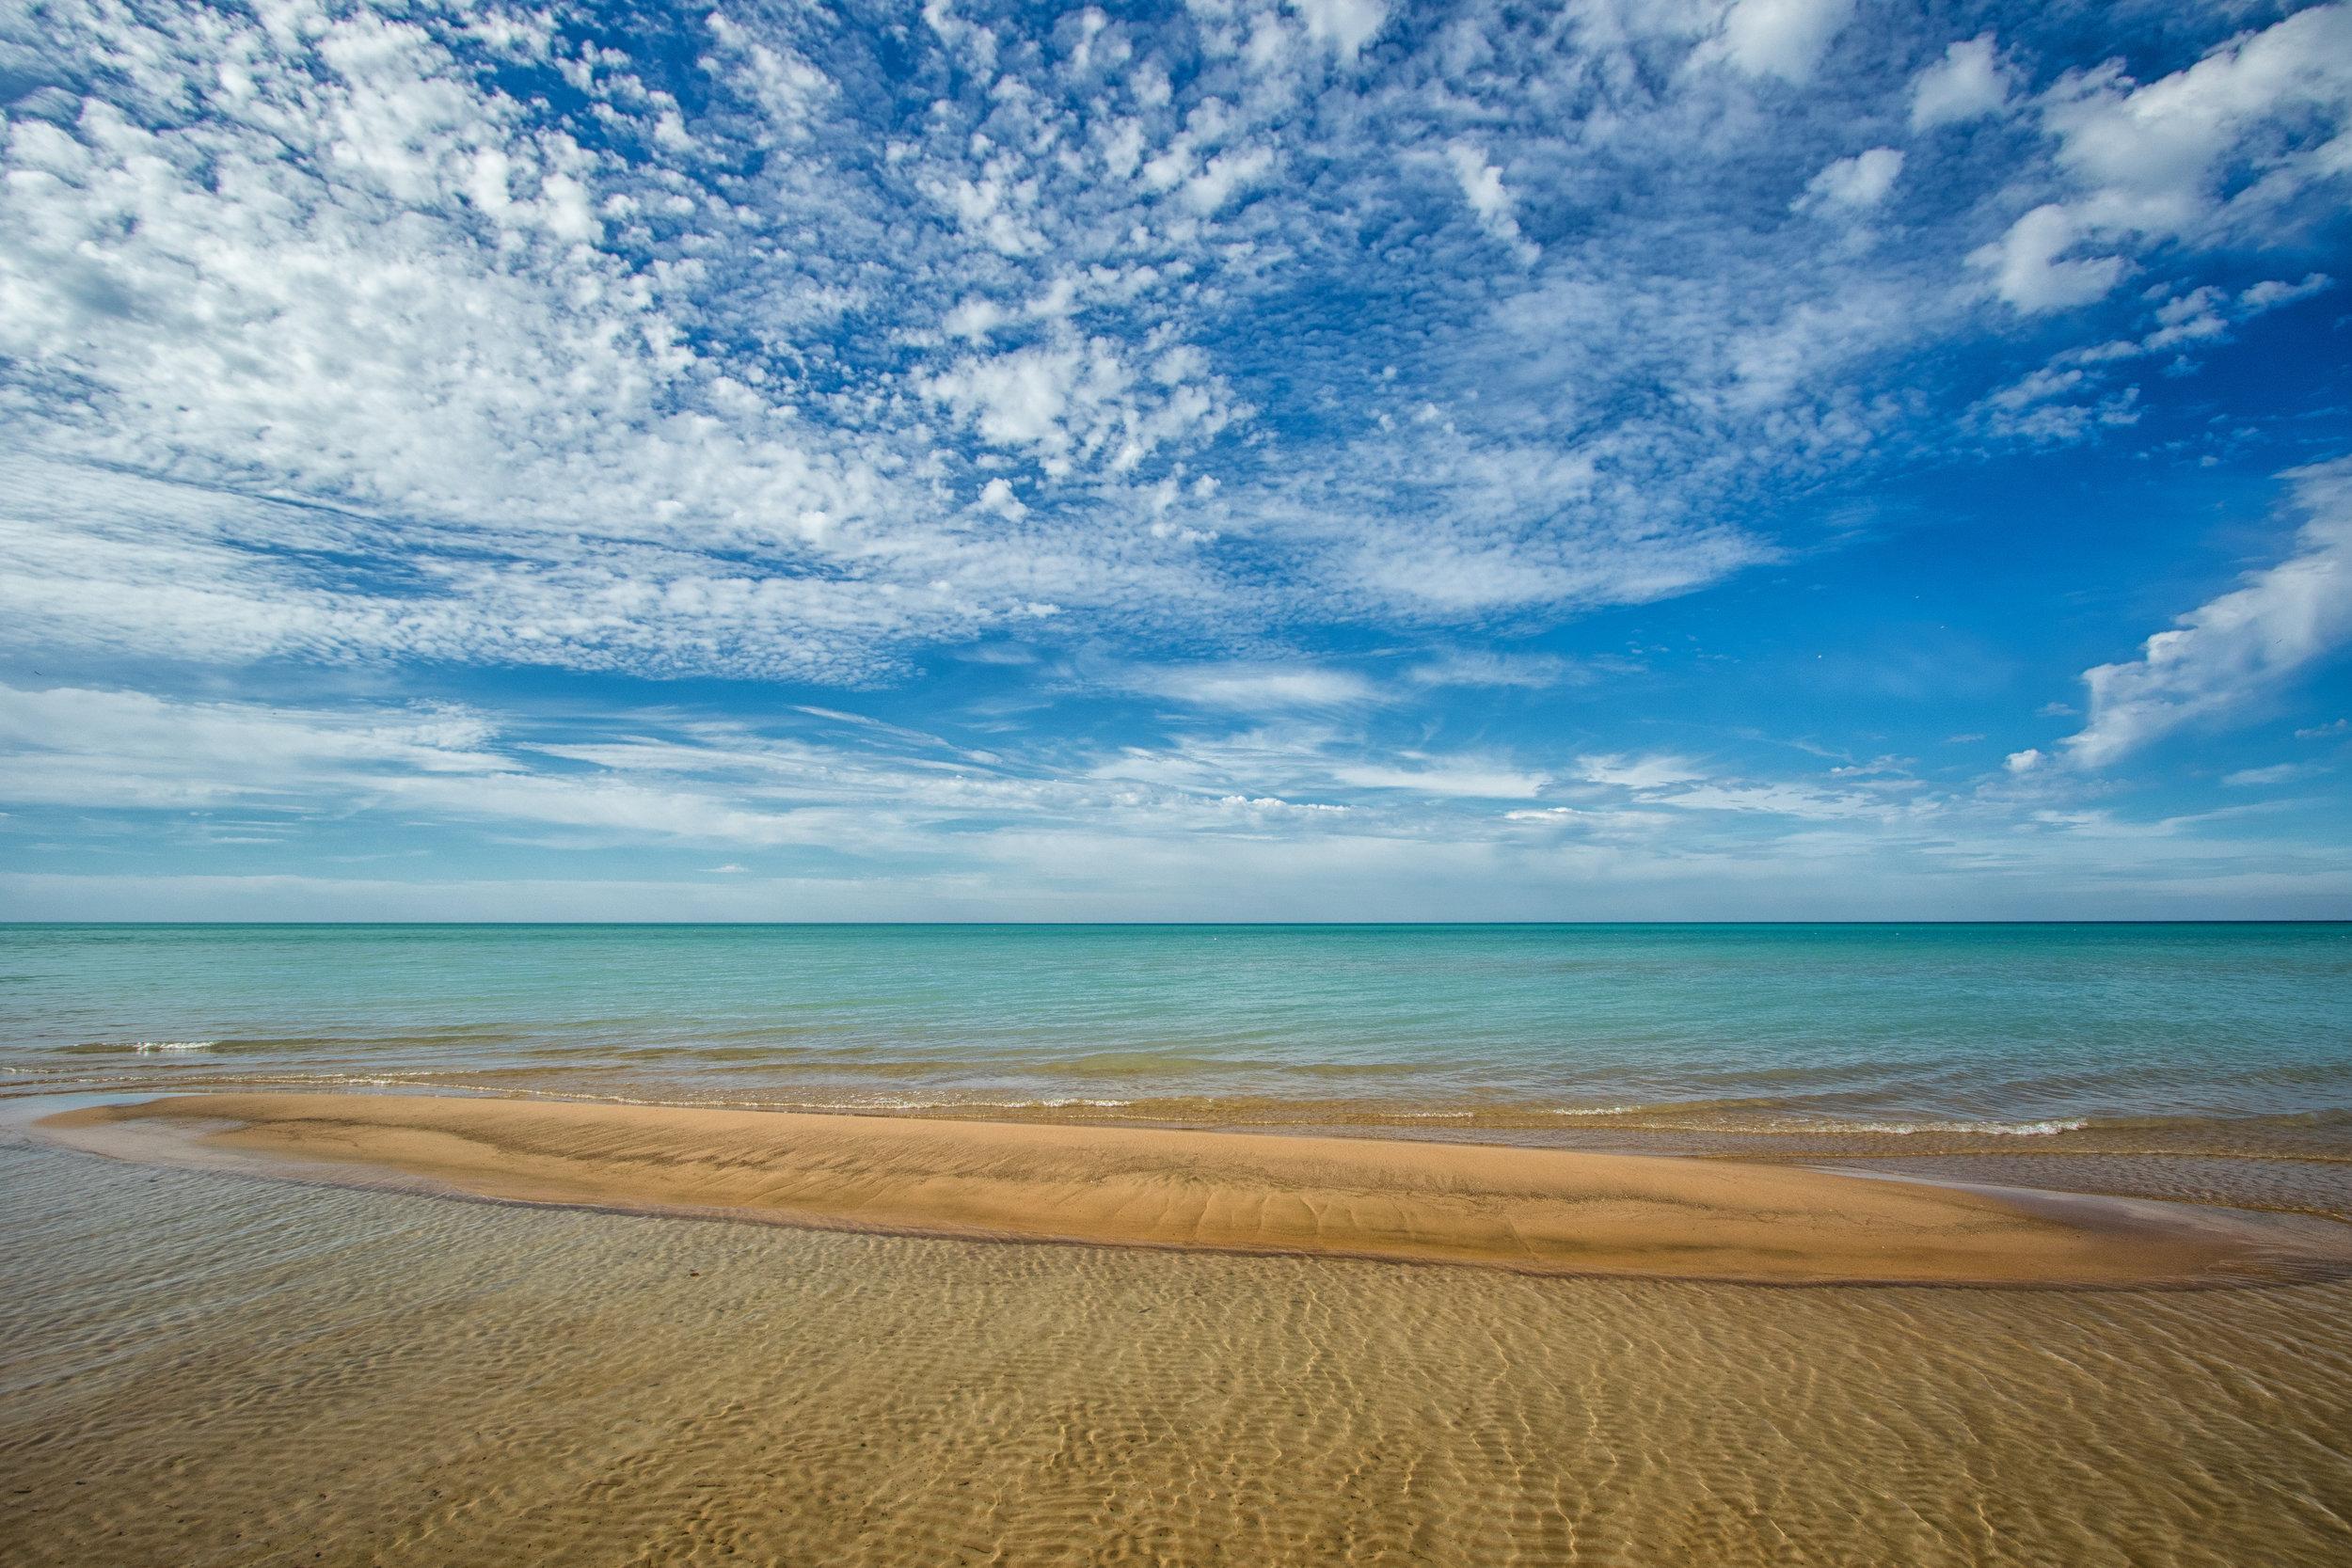 Caribbean Lake Huron